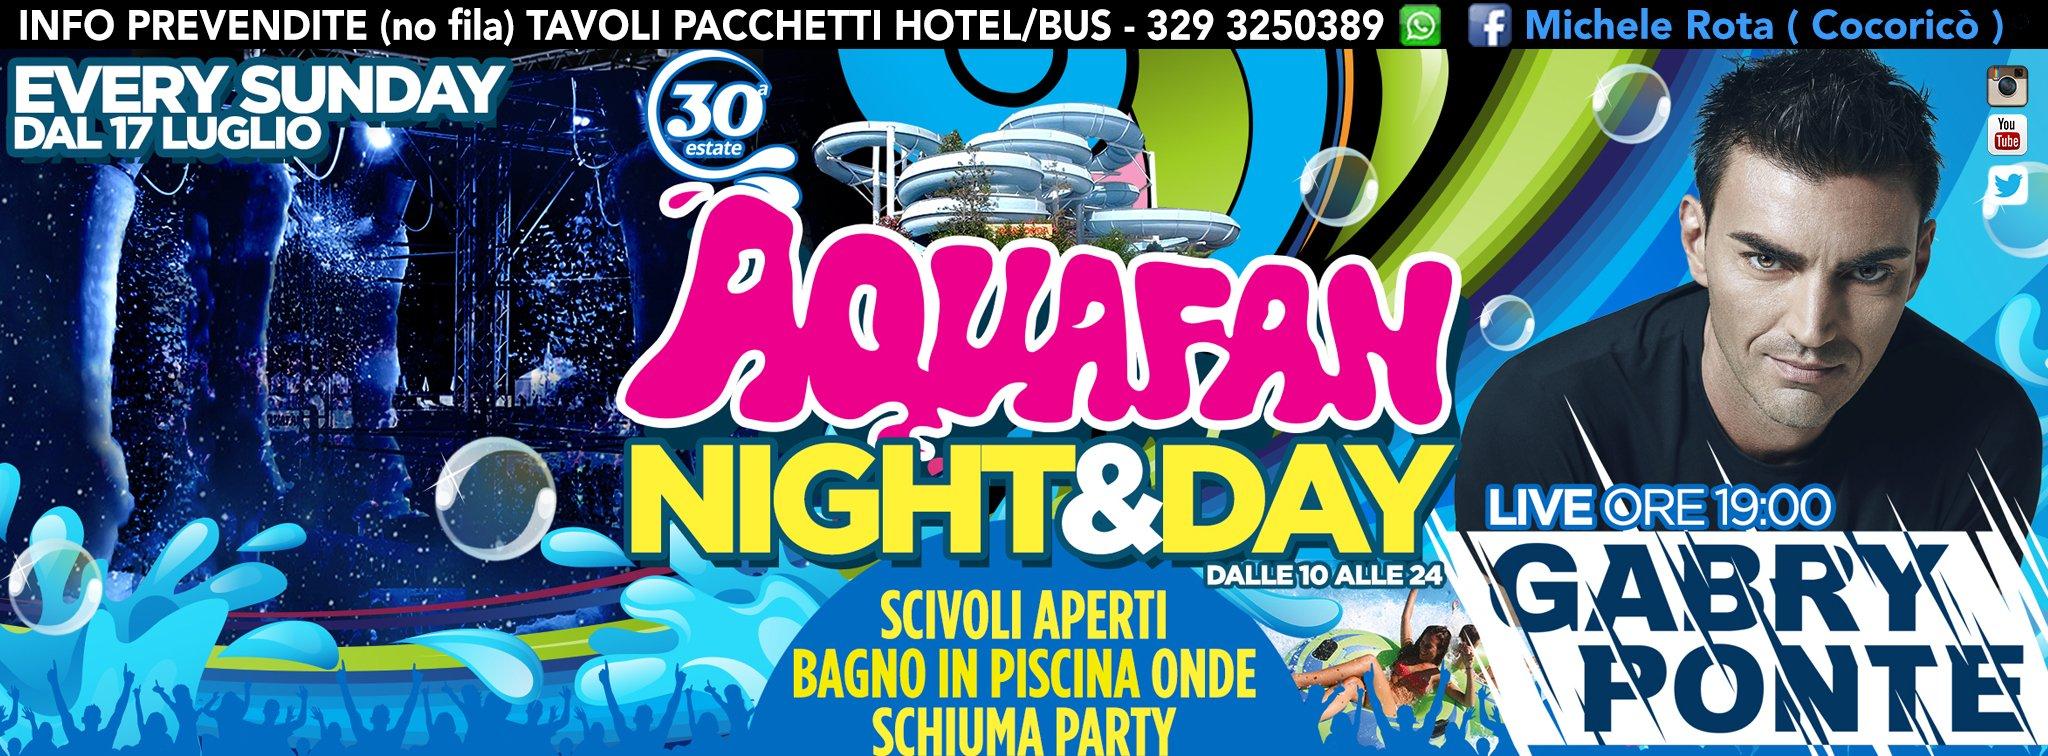 Aquafan Schiuma Party 2016 Night Day Gabry Ponte